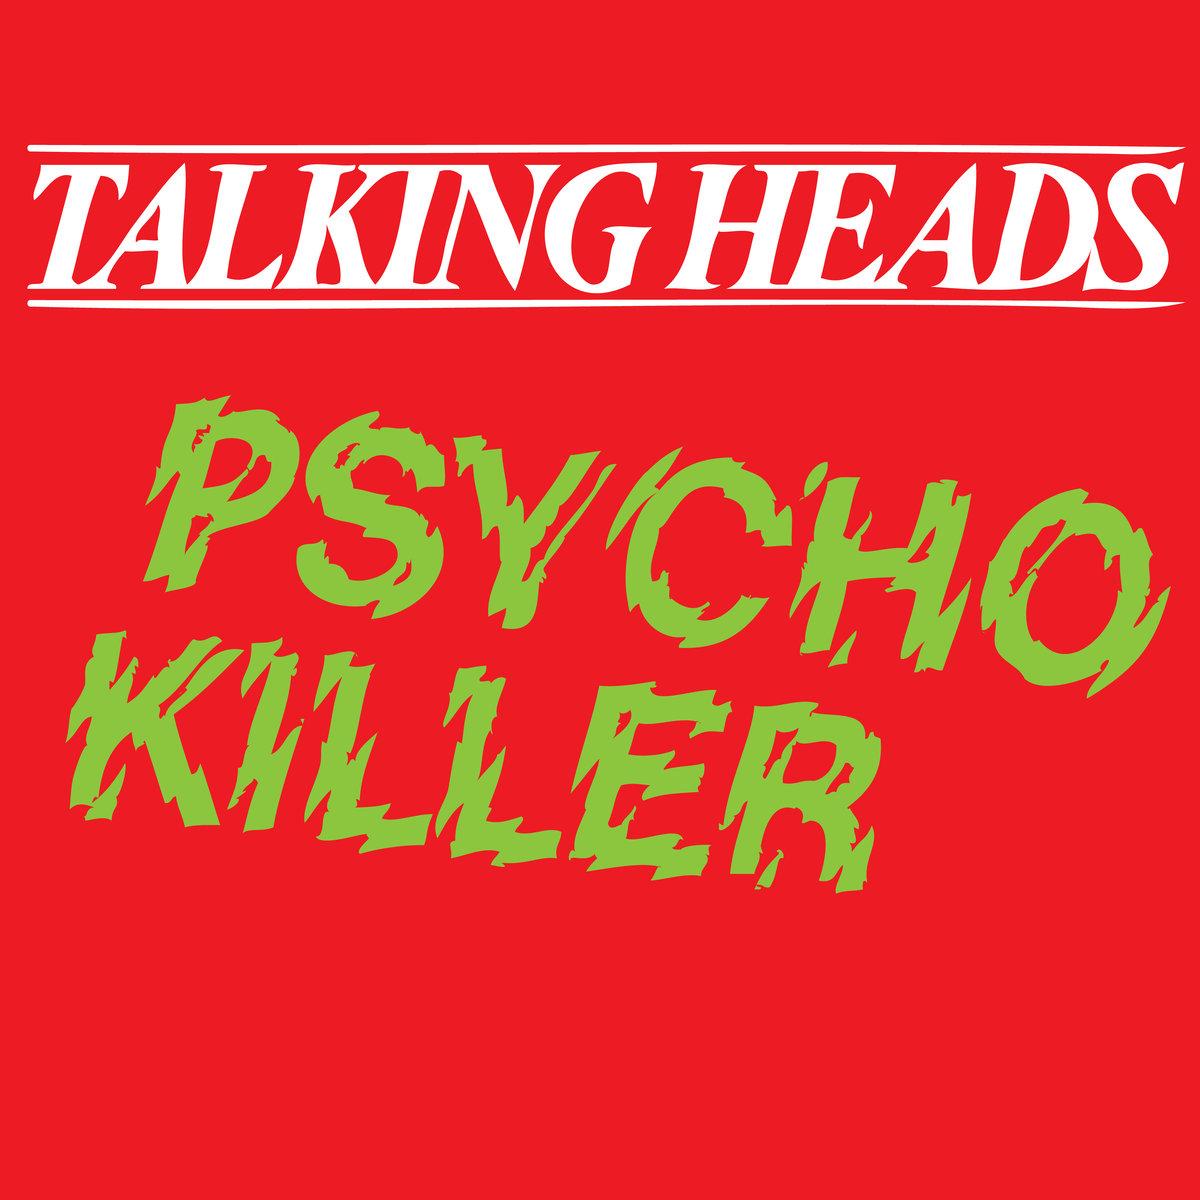 Talking Heads – PsychoKiller